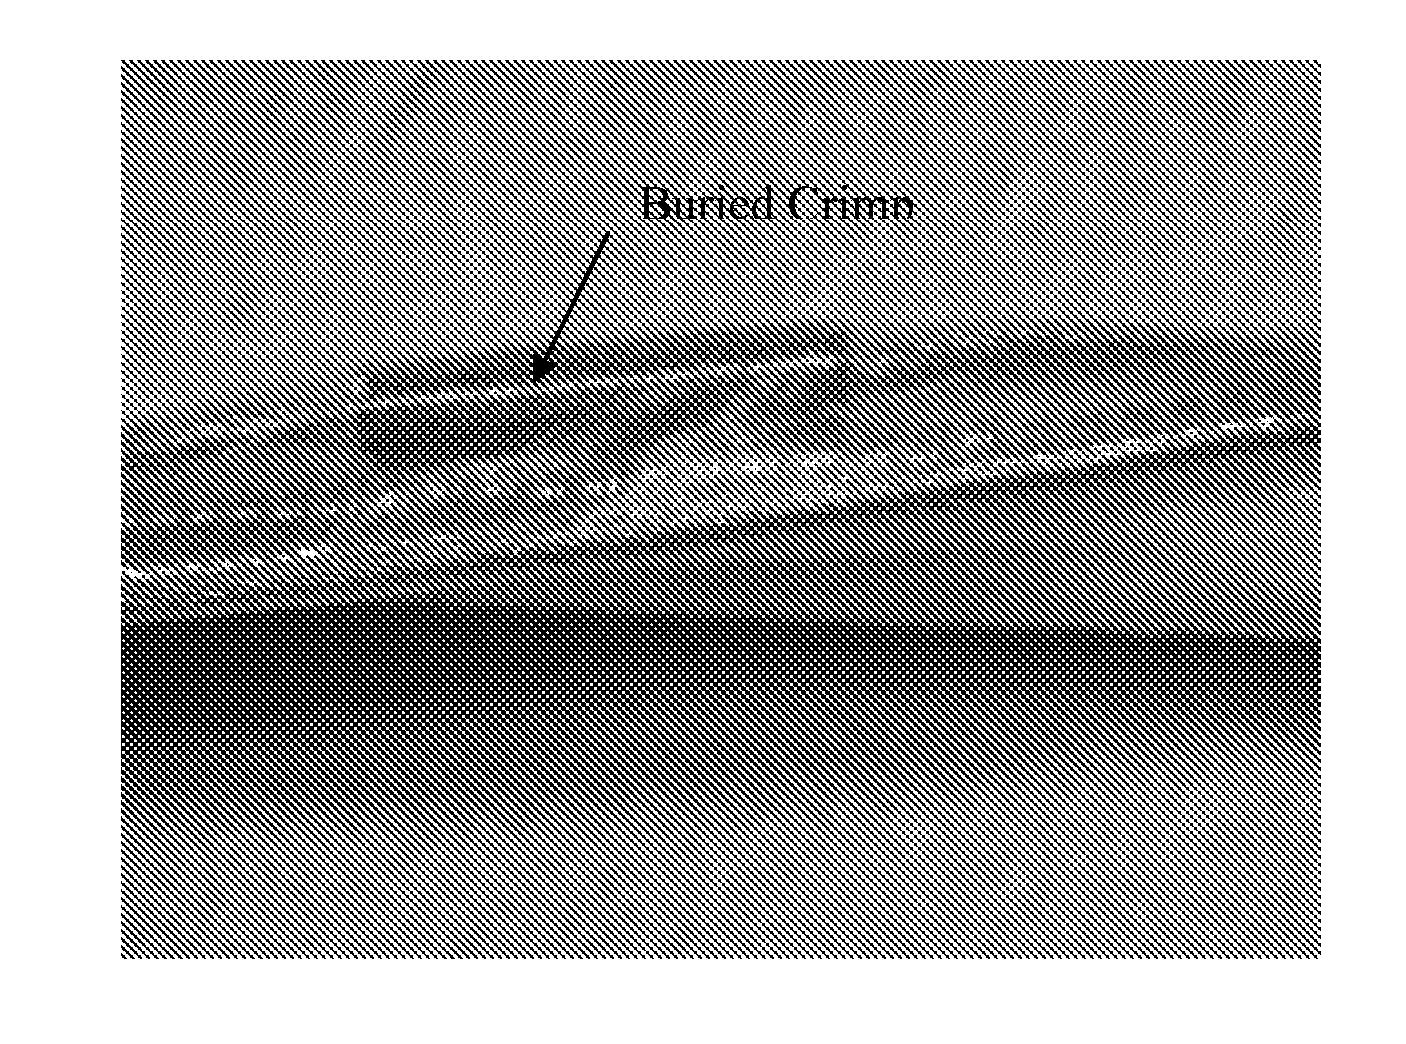 Figure US20070276458A1-20071129-P00008